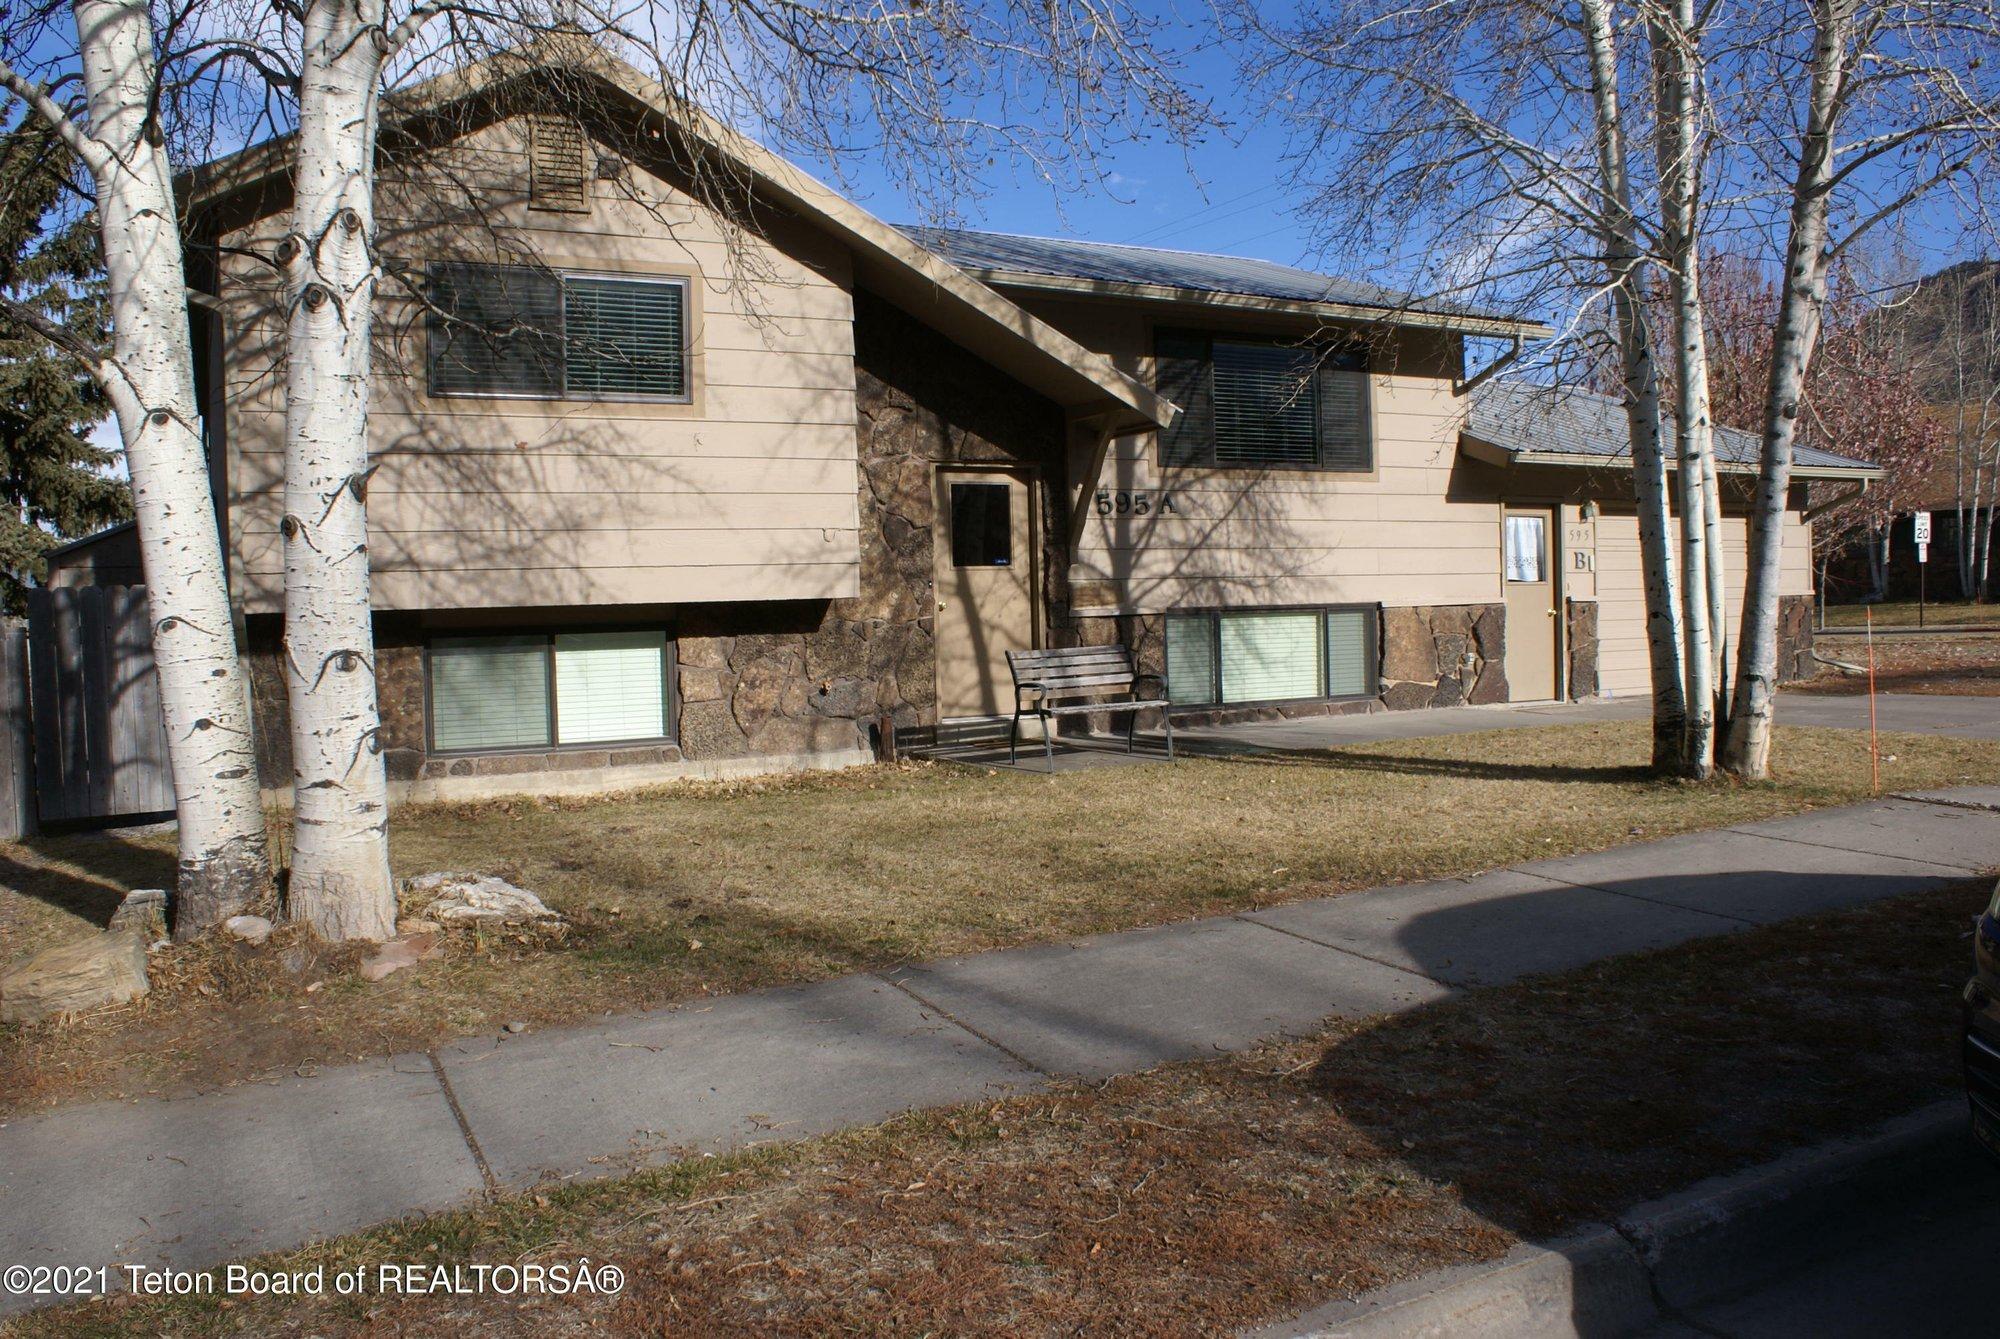 House in Jackson, Wyoming, United States 1